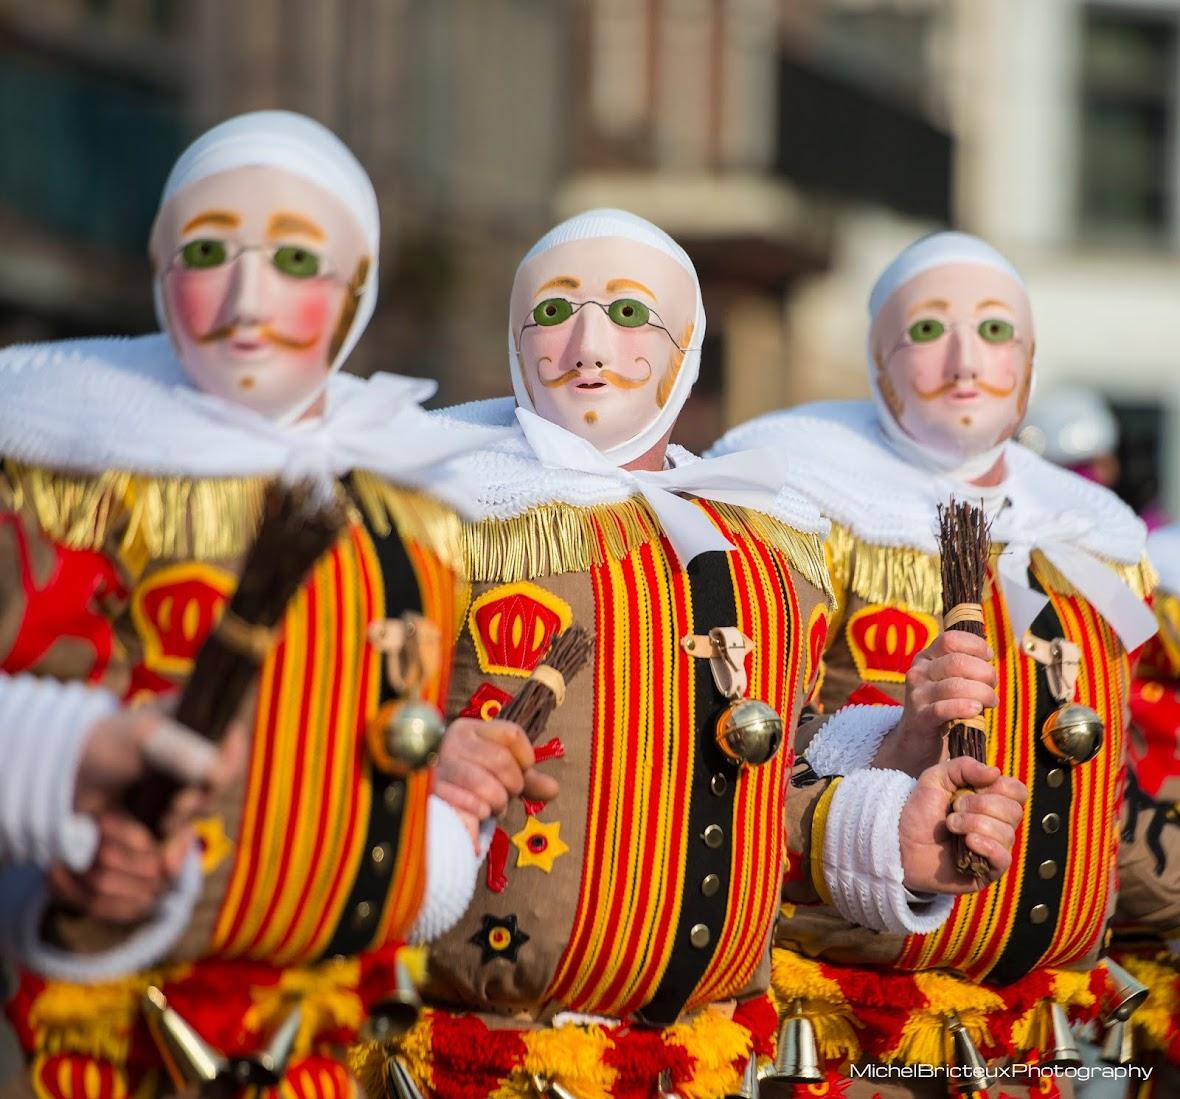 Carnaval de Binche - L'album complet